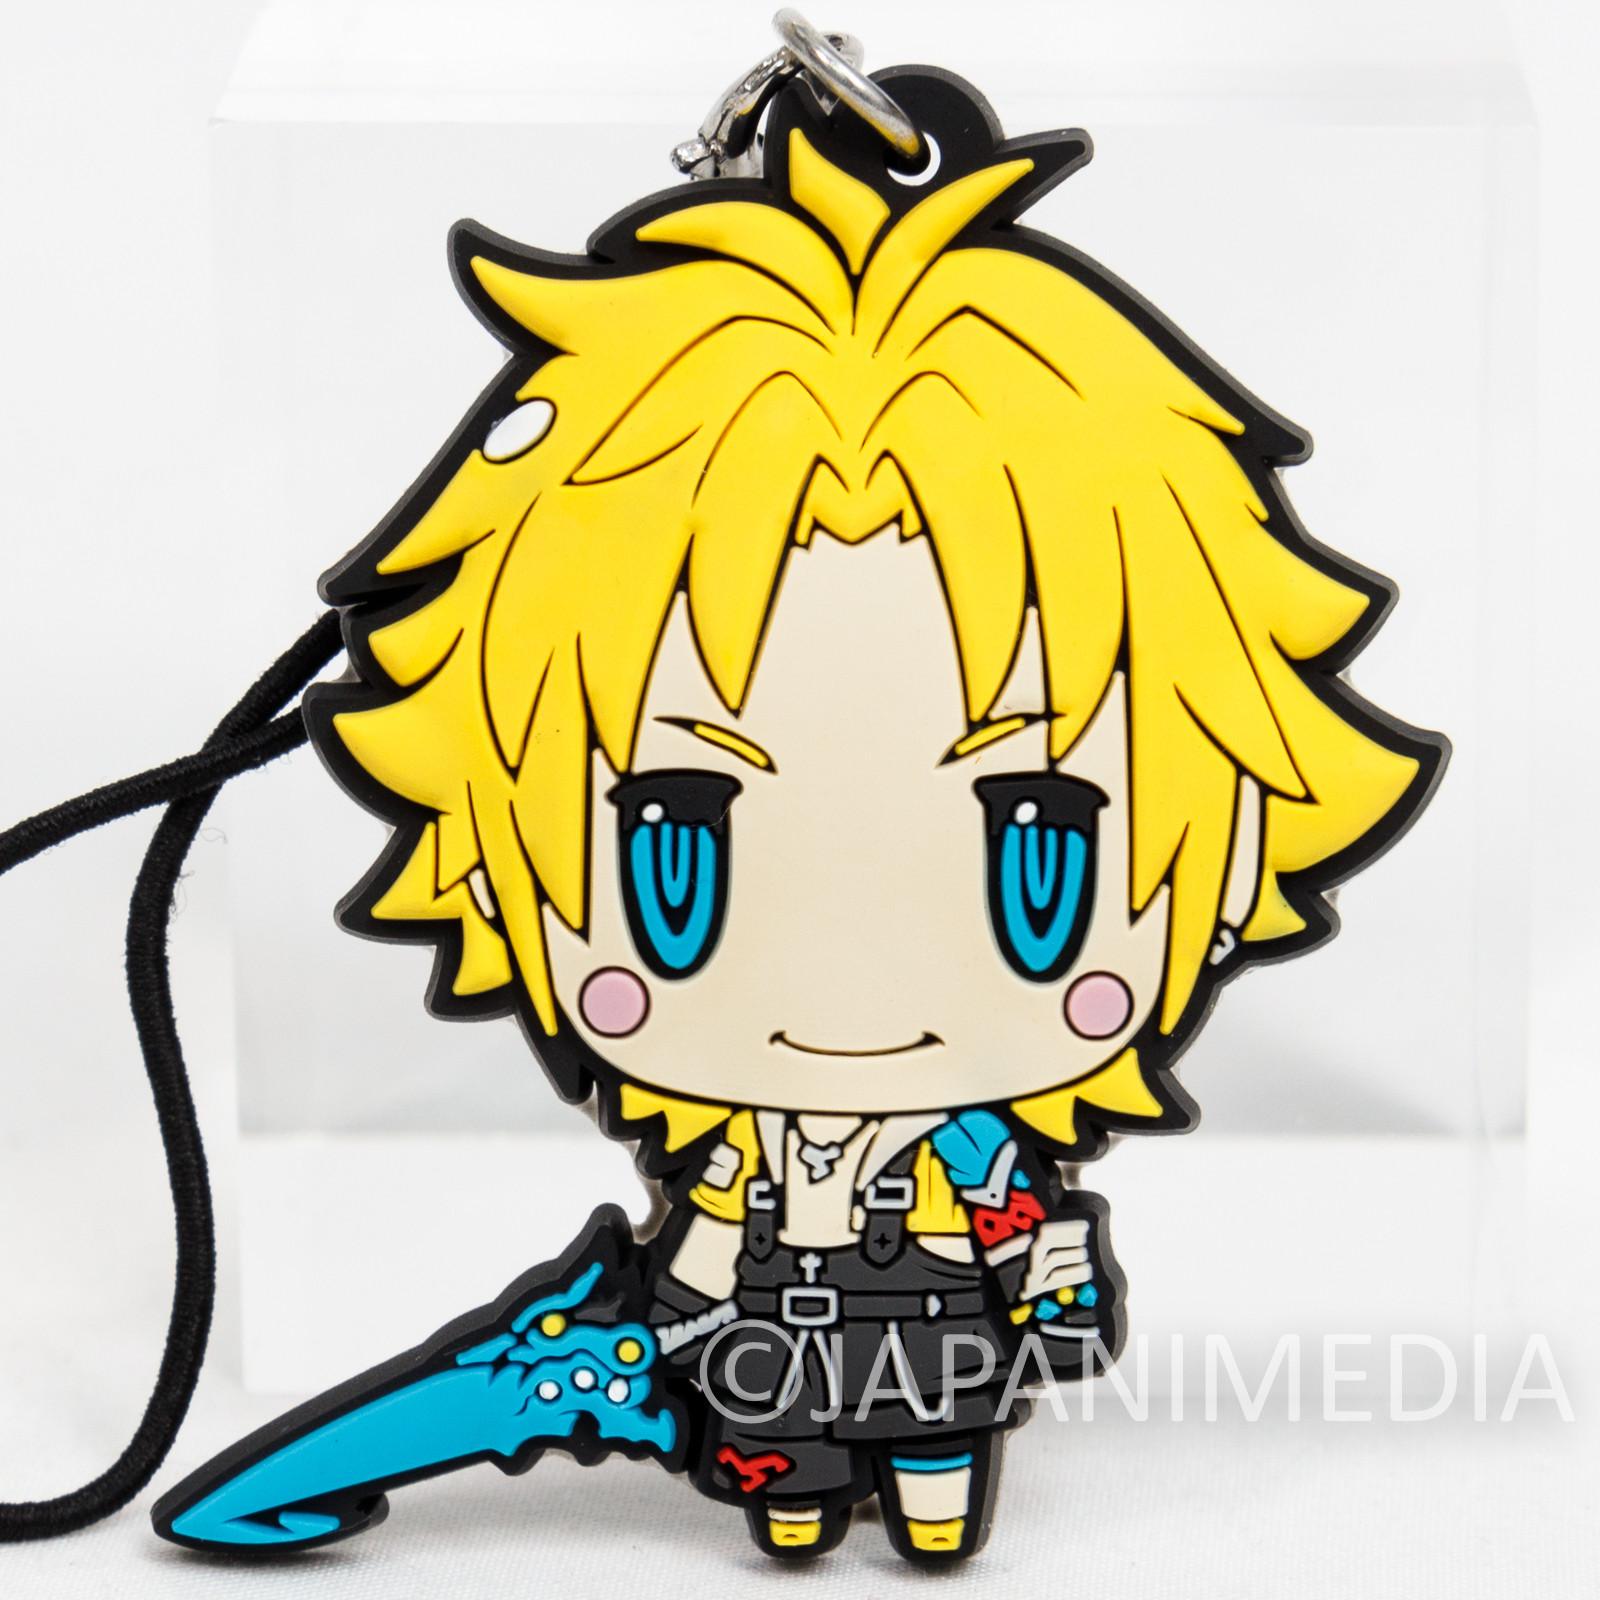 Final Fantasy Tidus Mascot Rubber Strap JAPAN SQUARE ENIX